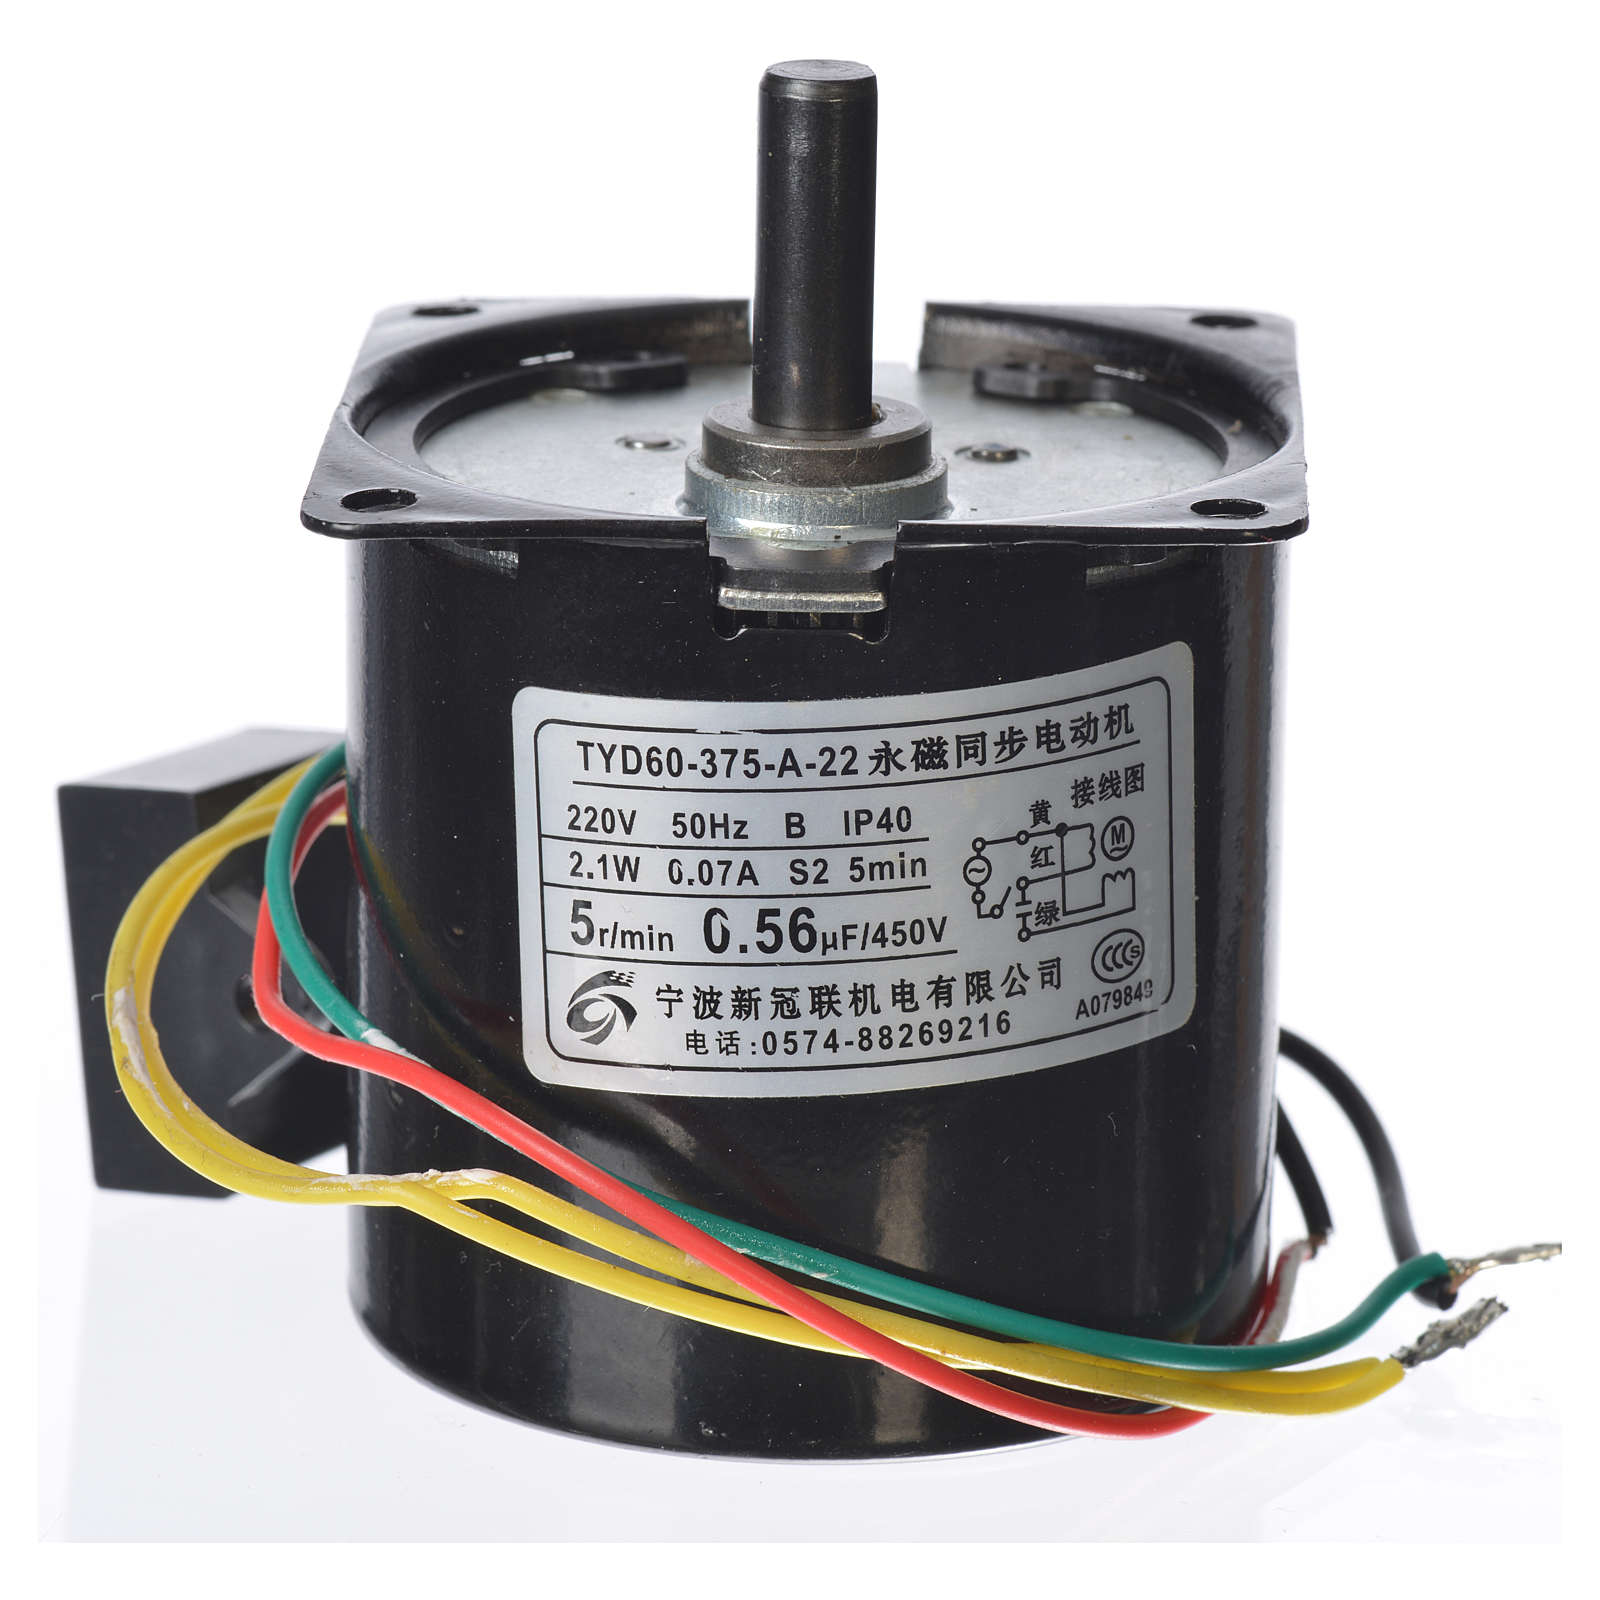 Motoriduttore MPW 5 giri/min presepe 4